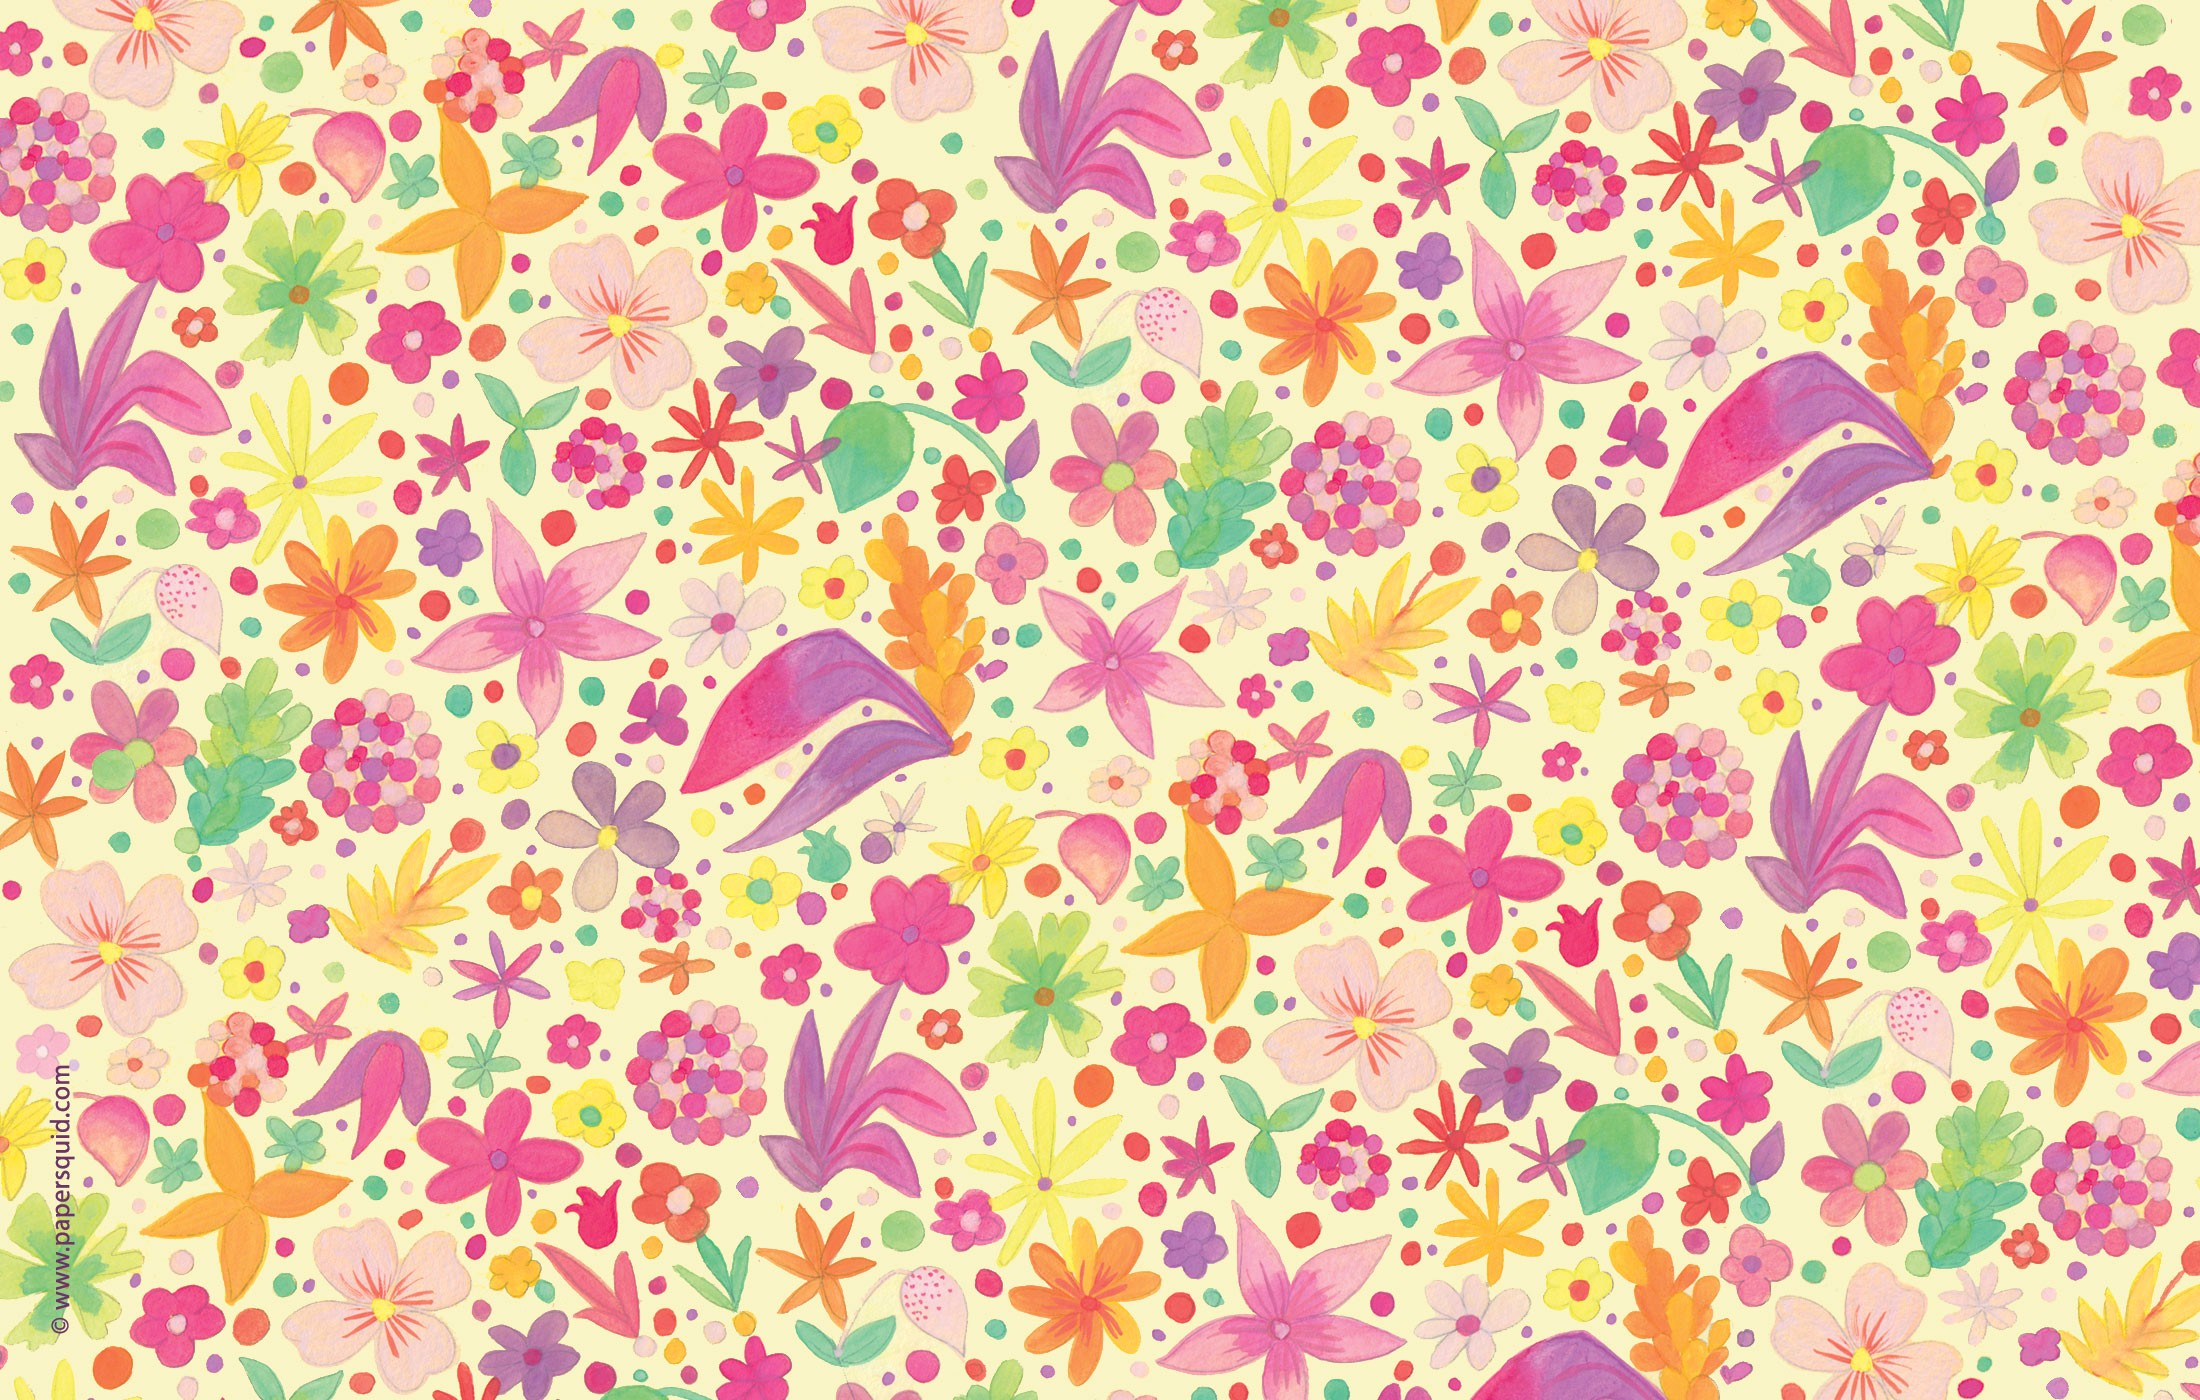 escaparate cute paper vintage floral iphone wallpaper tumblr 2200x1400